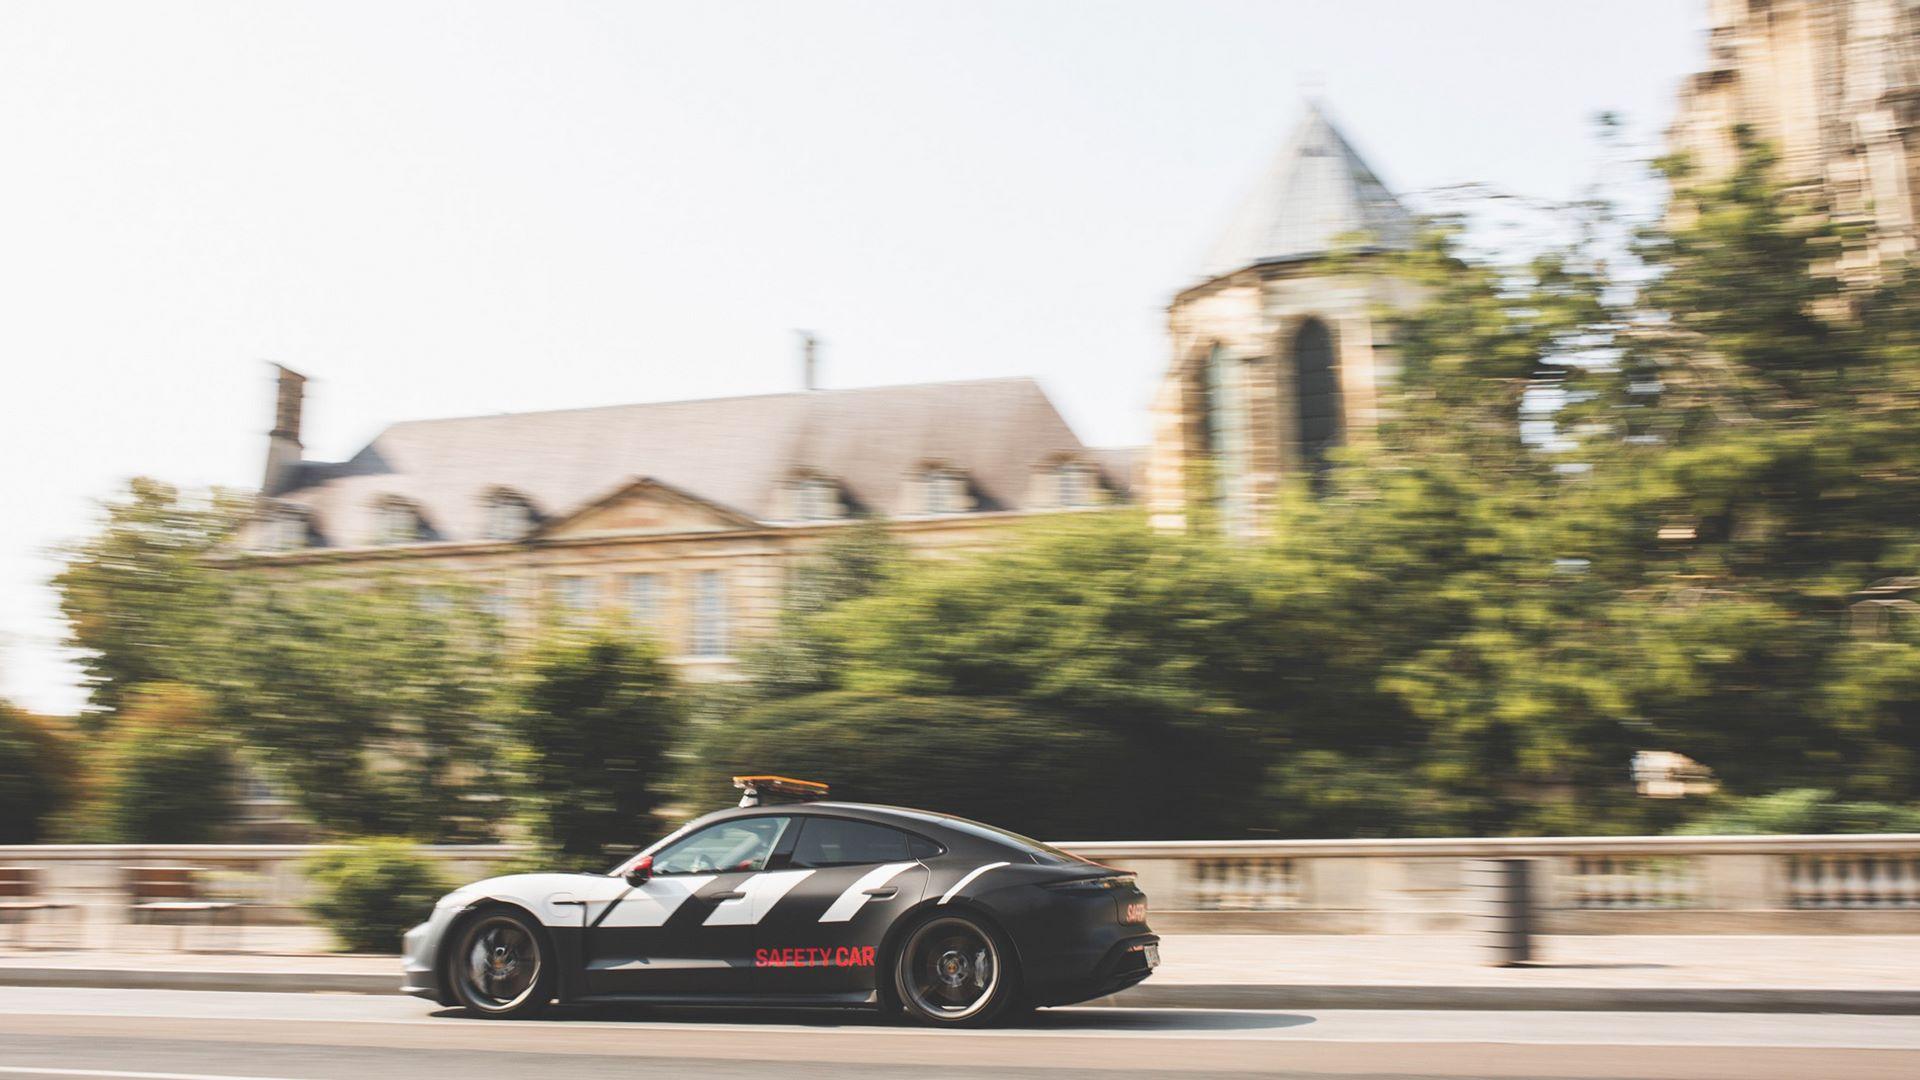 Porsche-Taycan-Turbo-safety-car-Le-Mans-2020-6